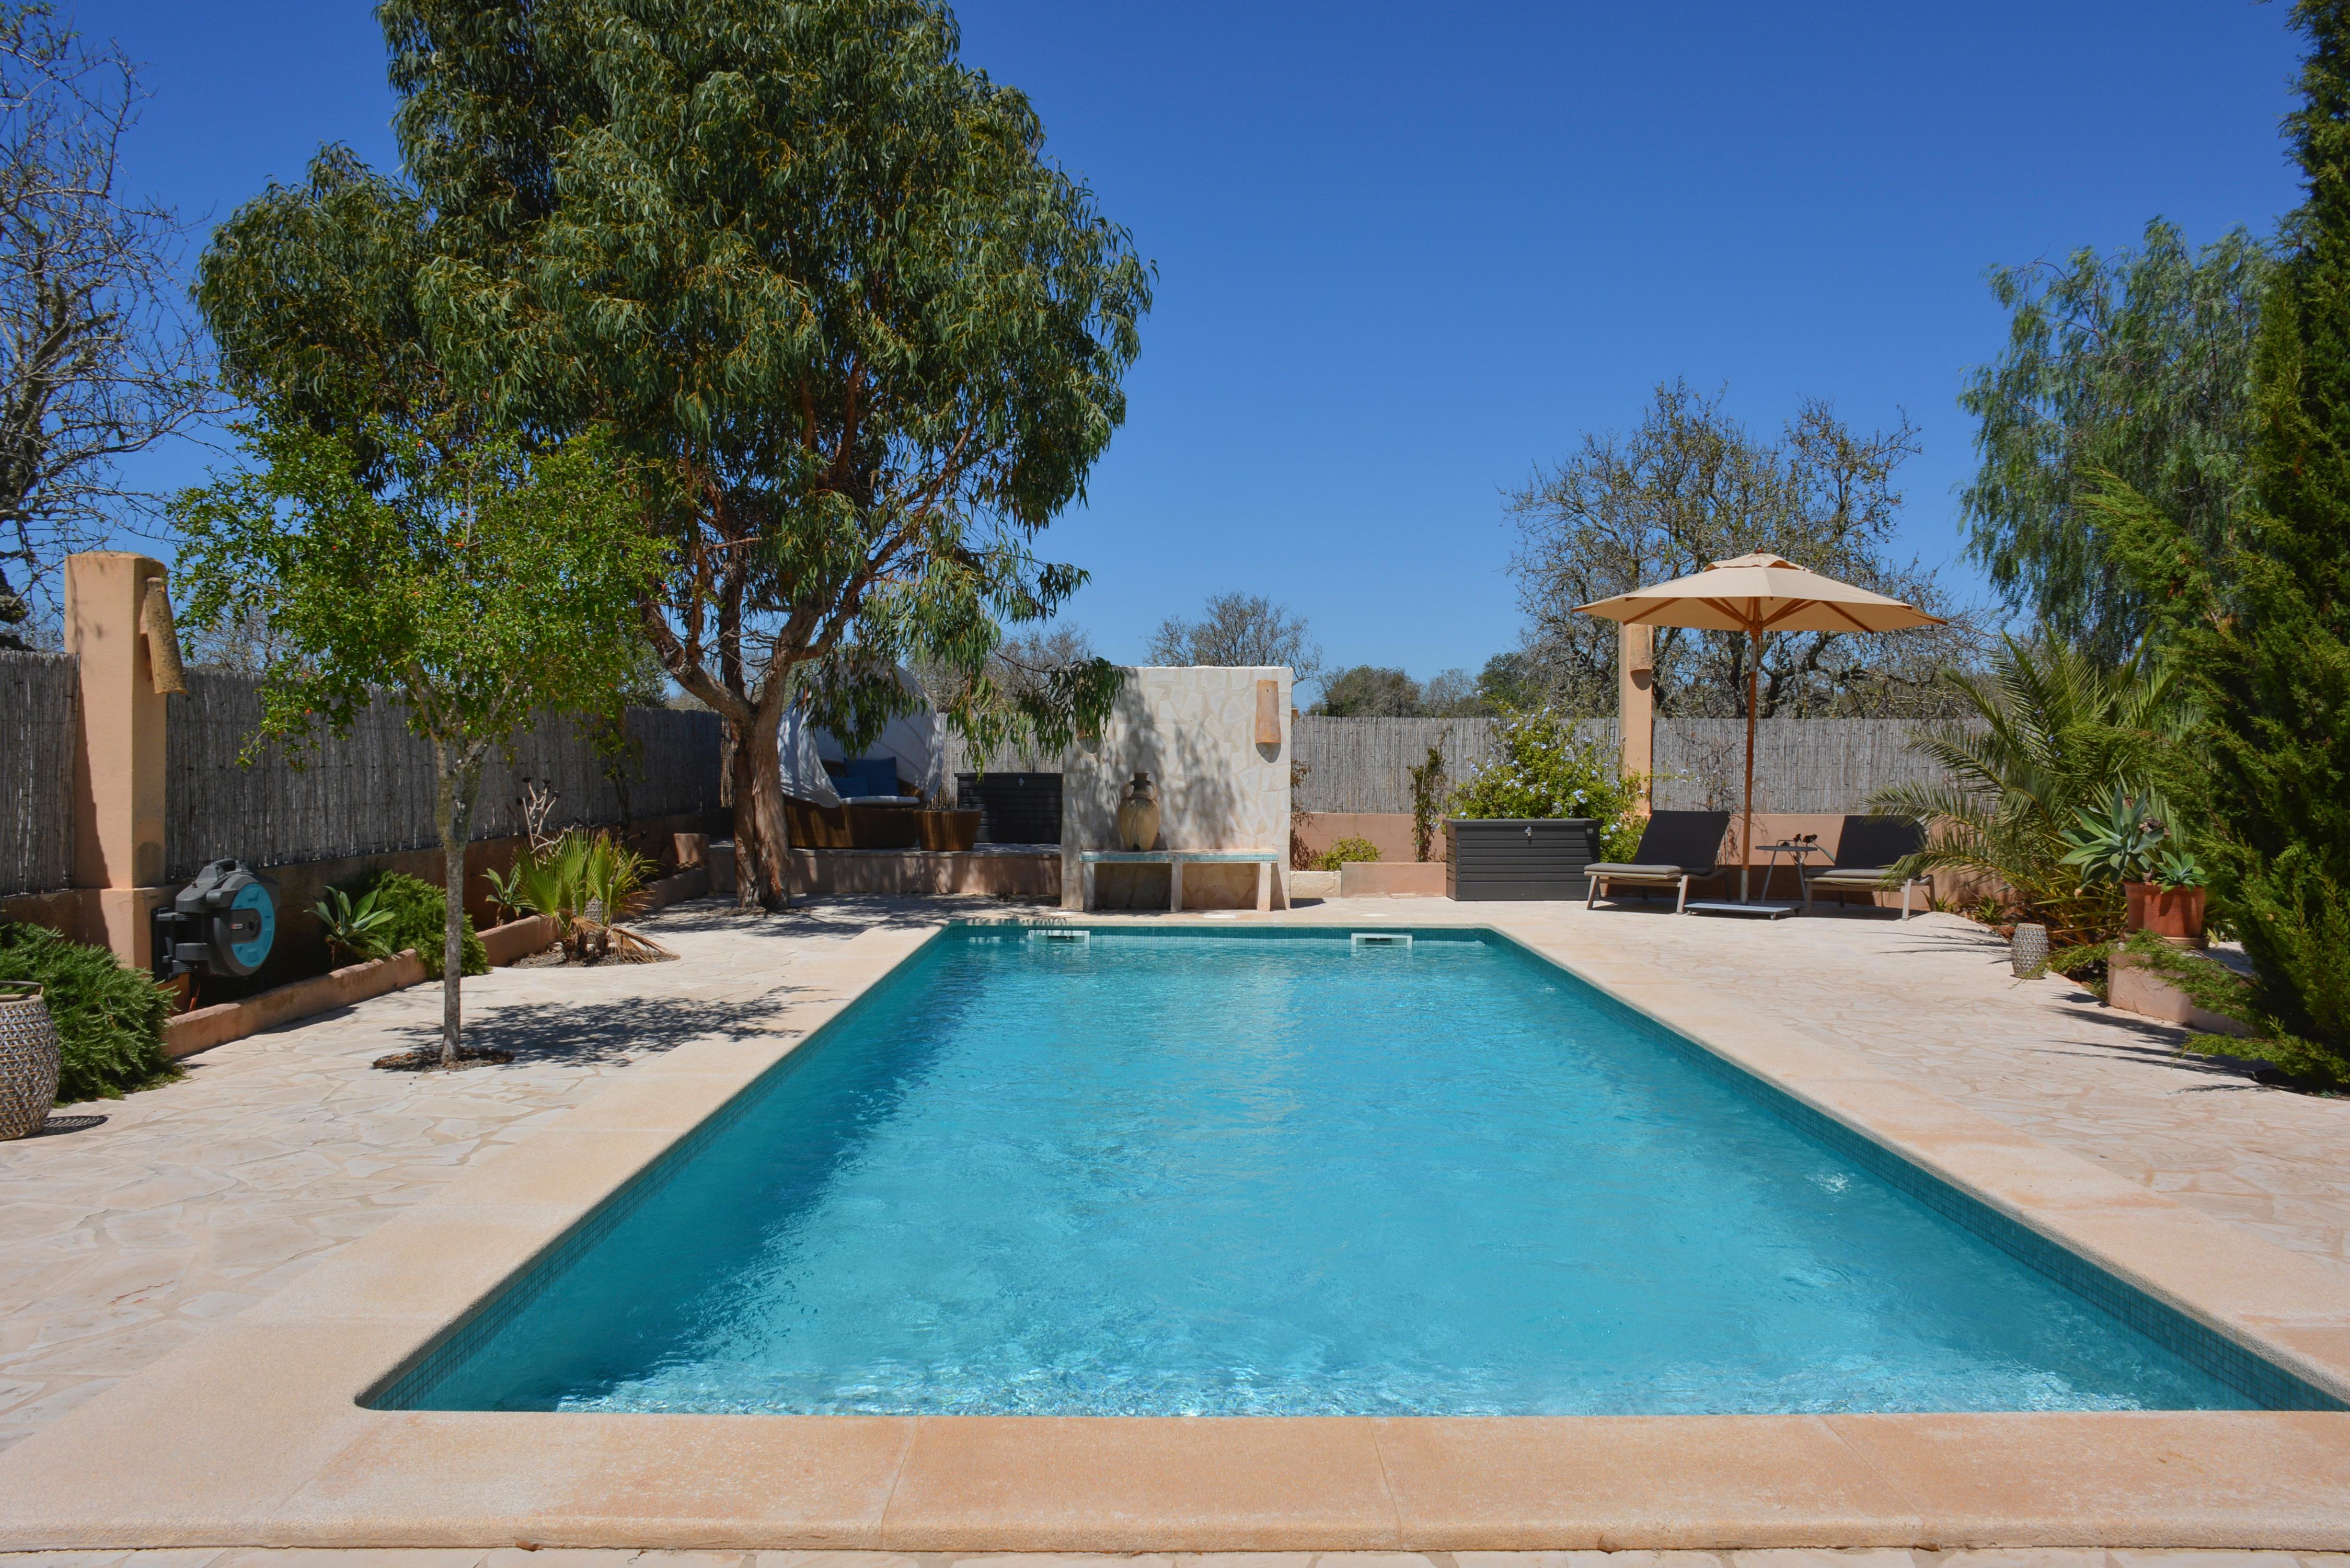 Exklusives Chalet mit großem Pool in Cala Llombards